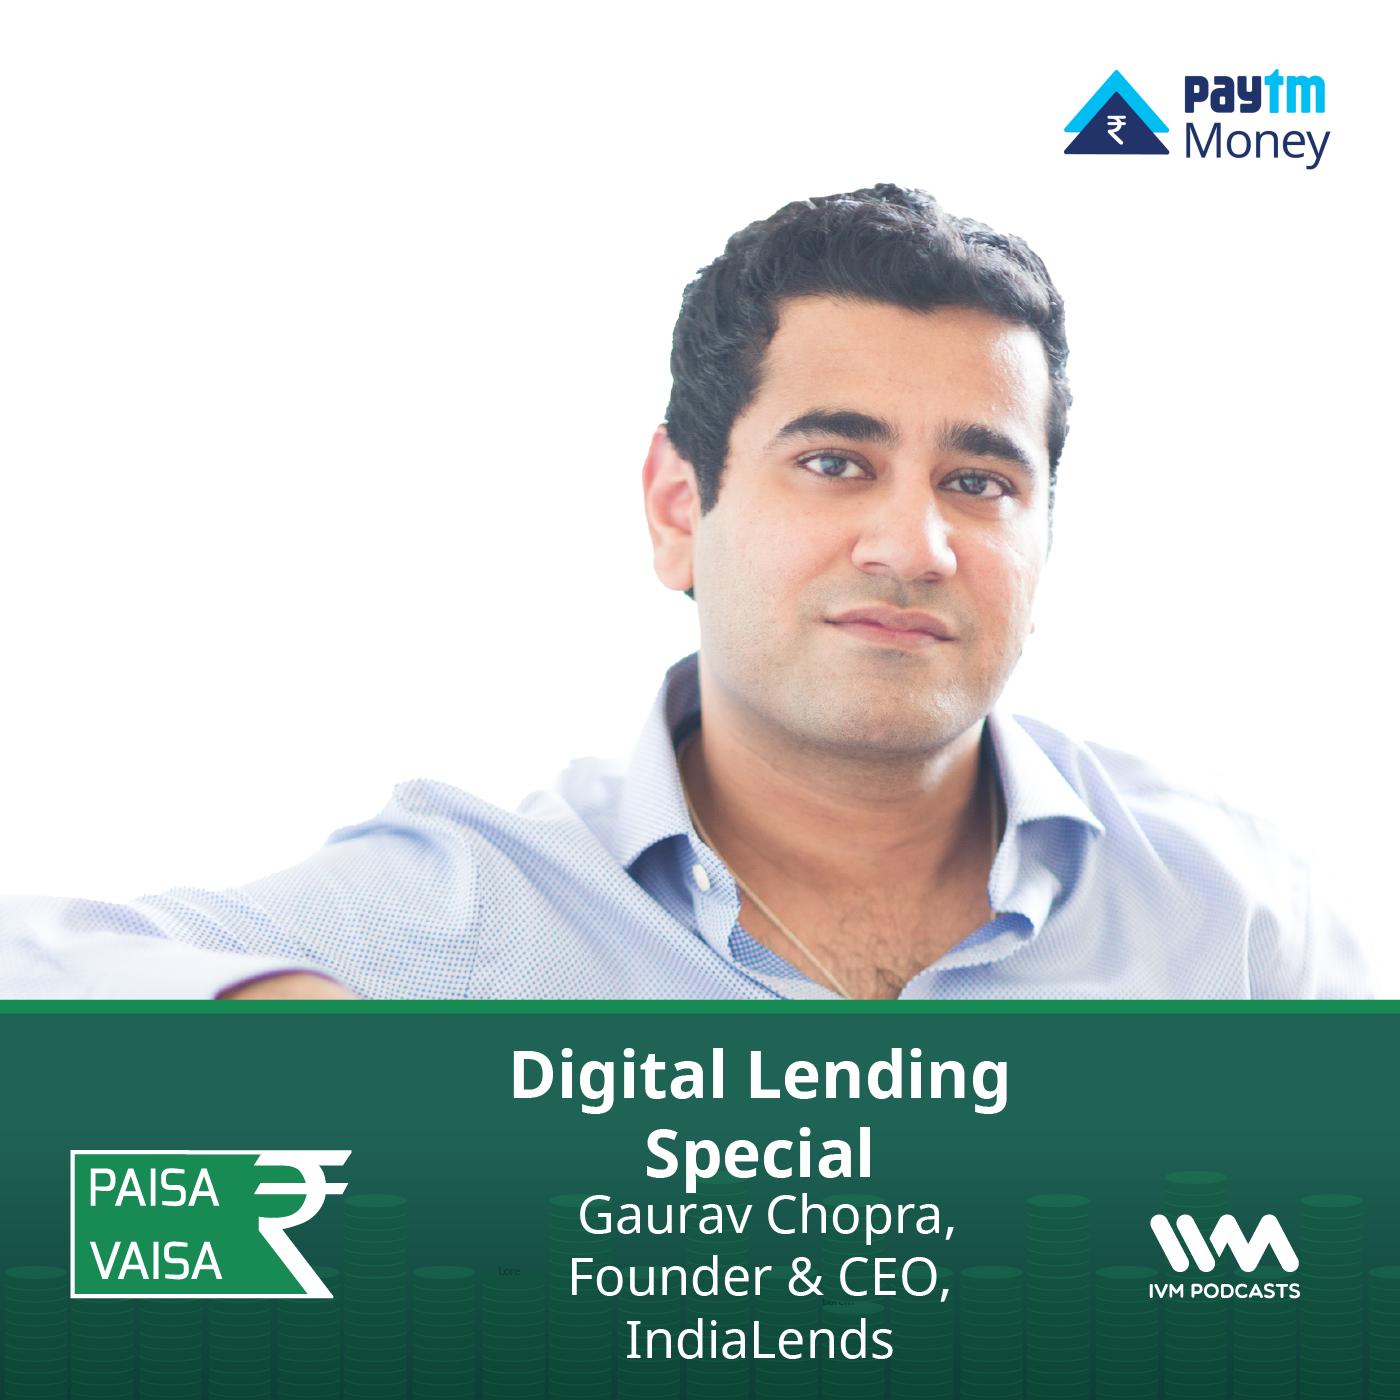 Ep. 242: Digital Lending Special